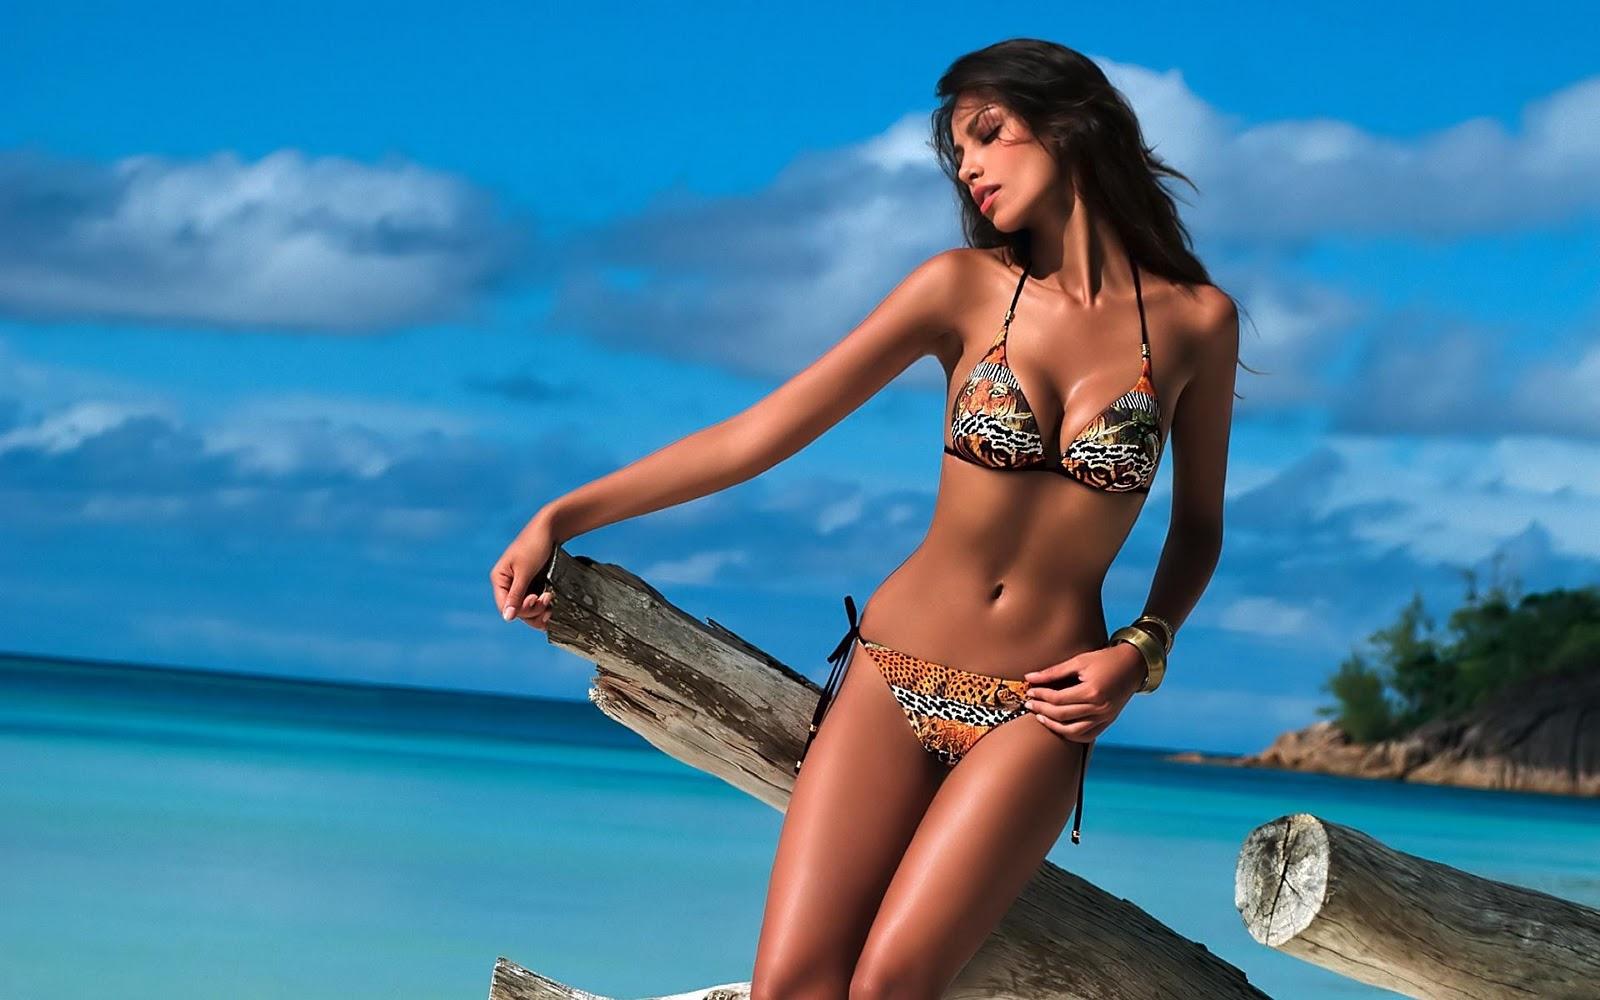 Hot Bikini Babes HD Wallpapers ~ Hot Photos Hub